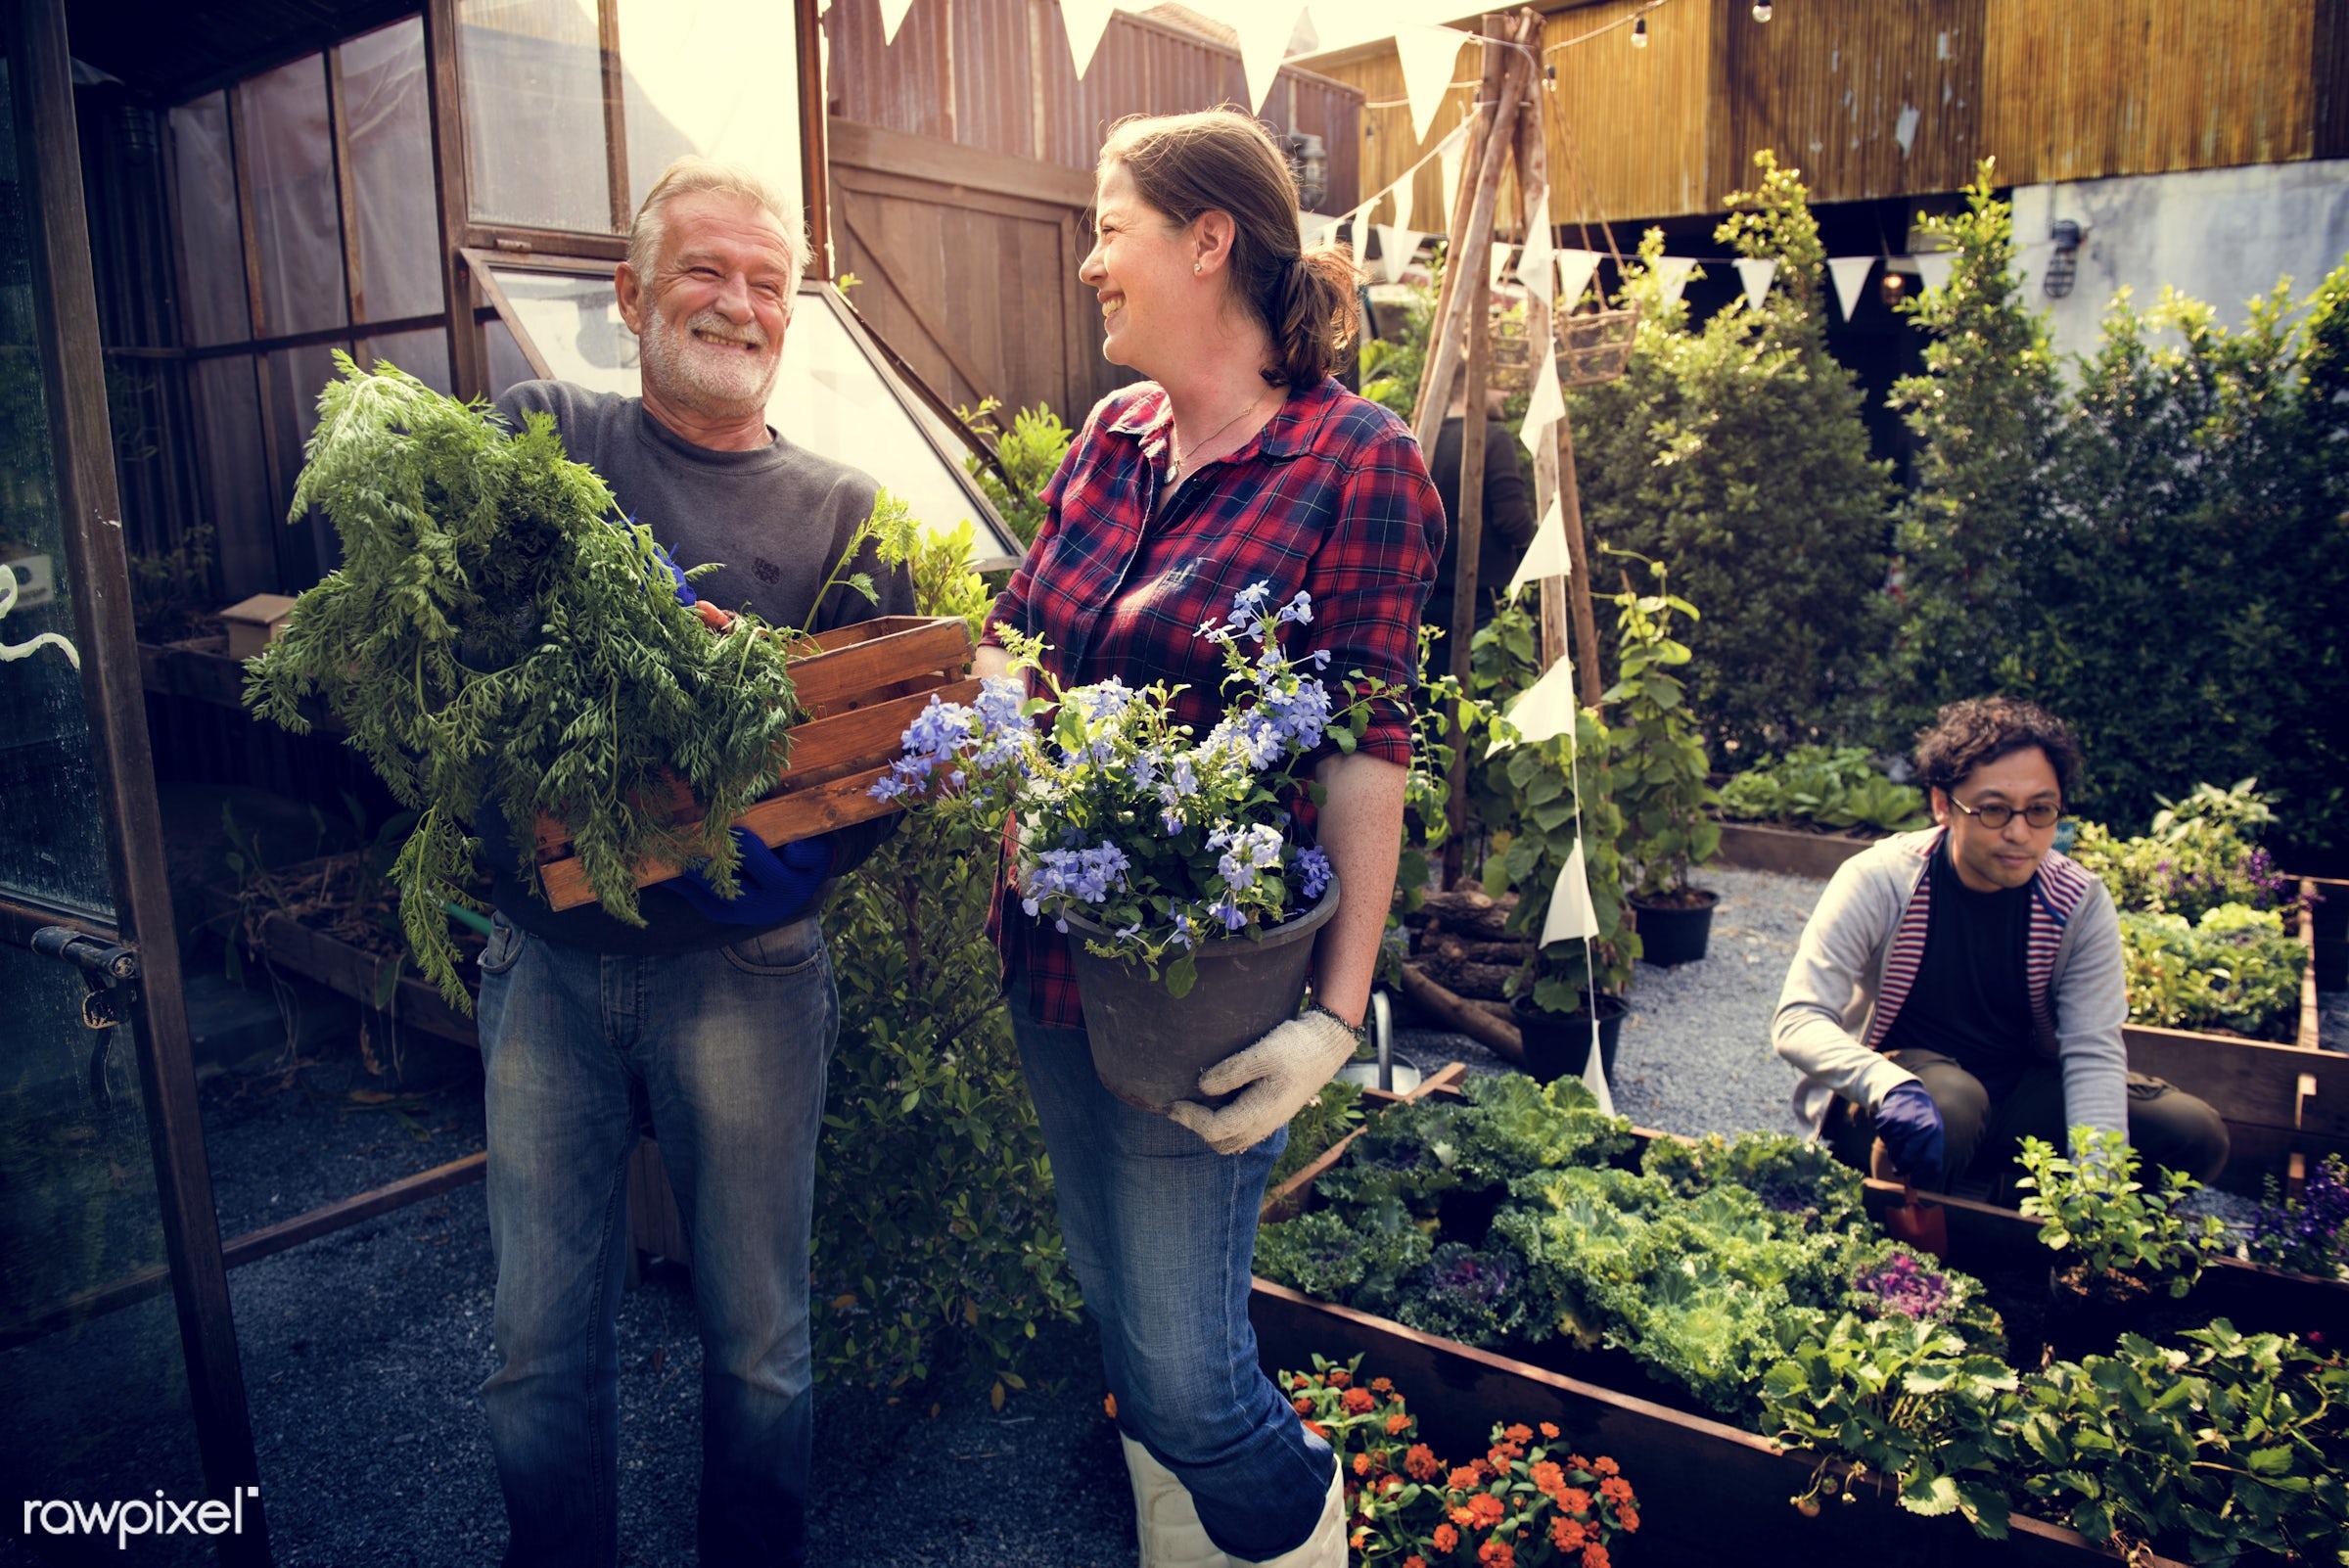 plant, nutritious, tomato, carrot, greenhouse, friends, farmer, fresh, lettuce, healthy eating, friendship, men, smile,...